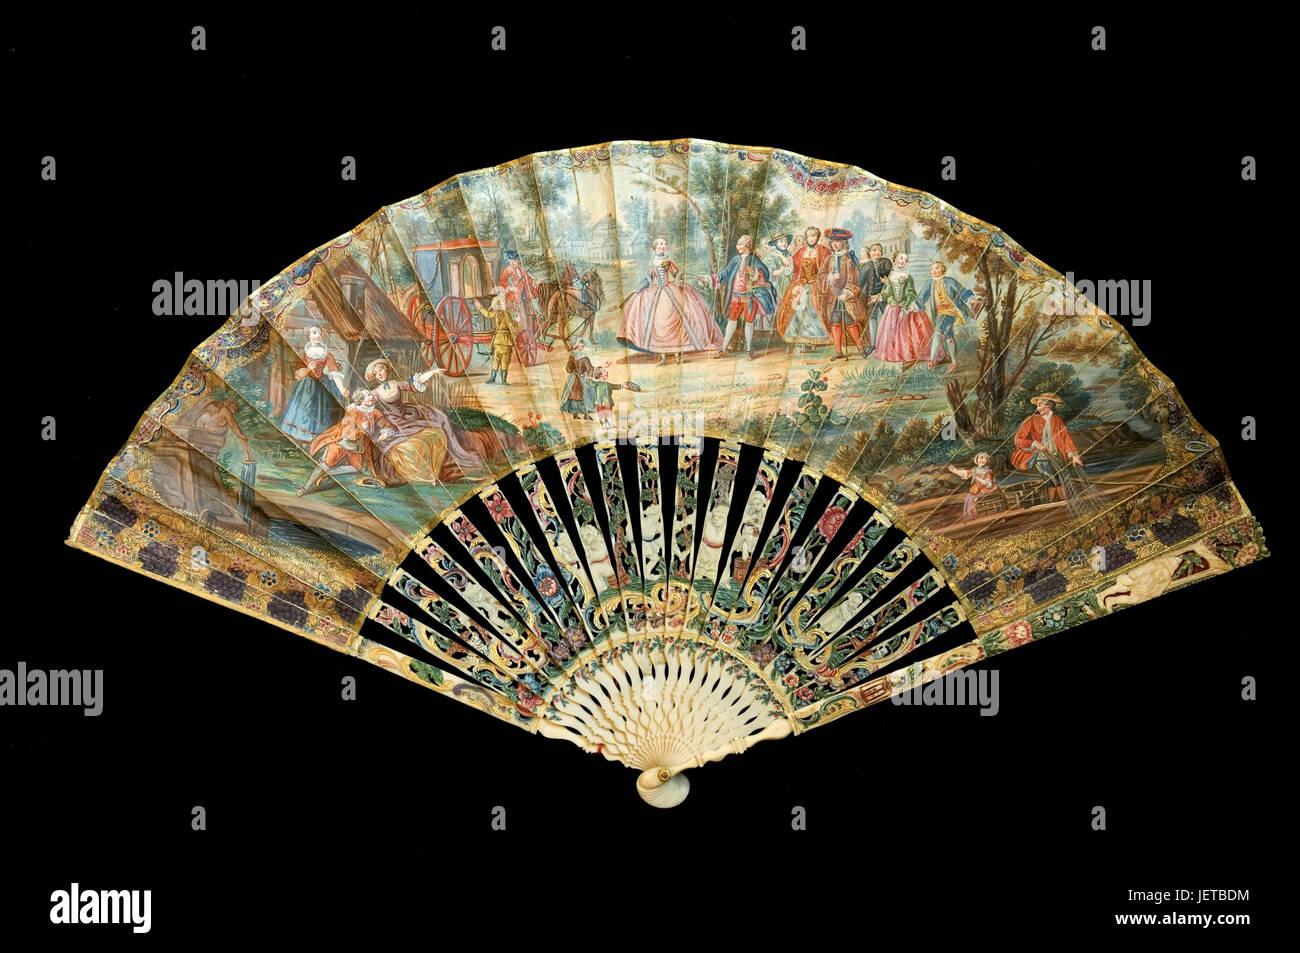 France, Paris, Musee de l'Eventail, fields, 'Scene galante inspiree du mariage de Louis XV', in 1750, - Stock Image